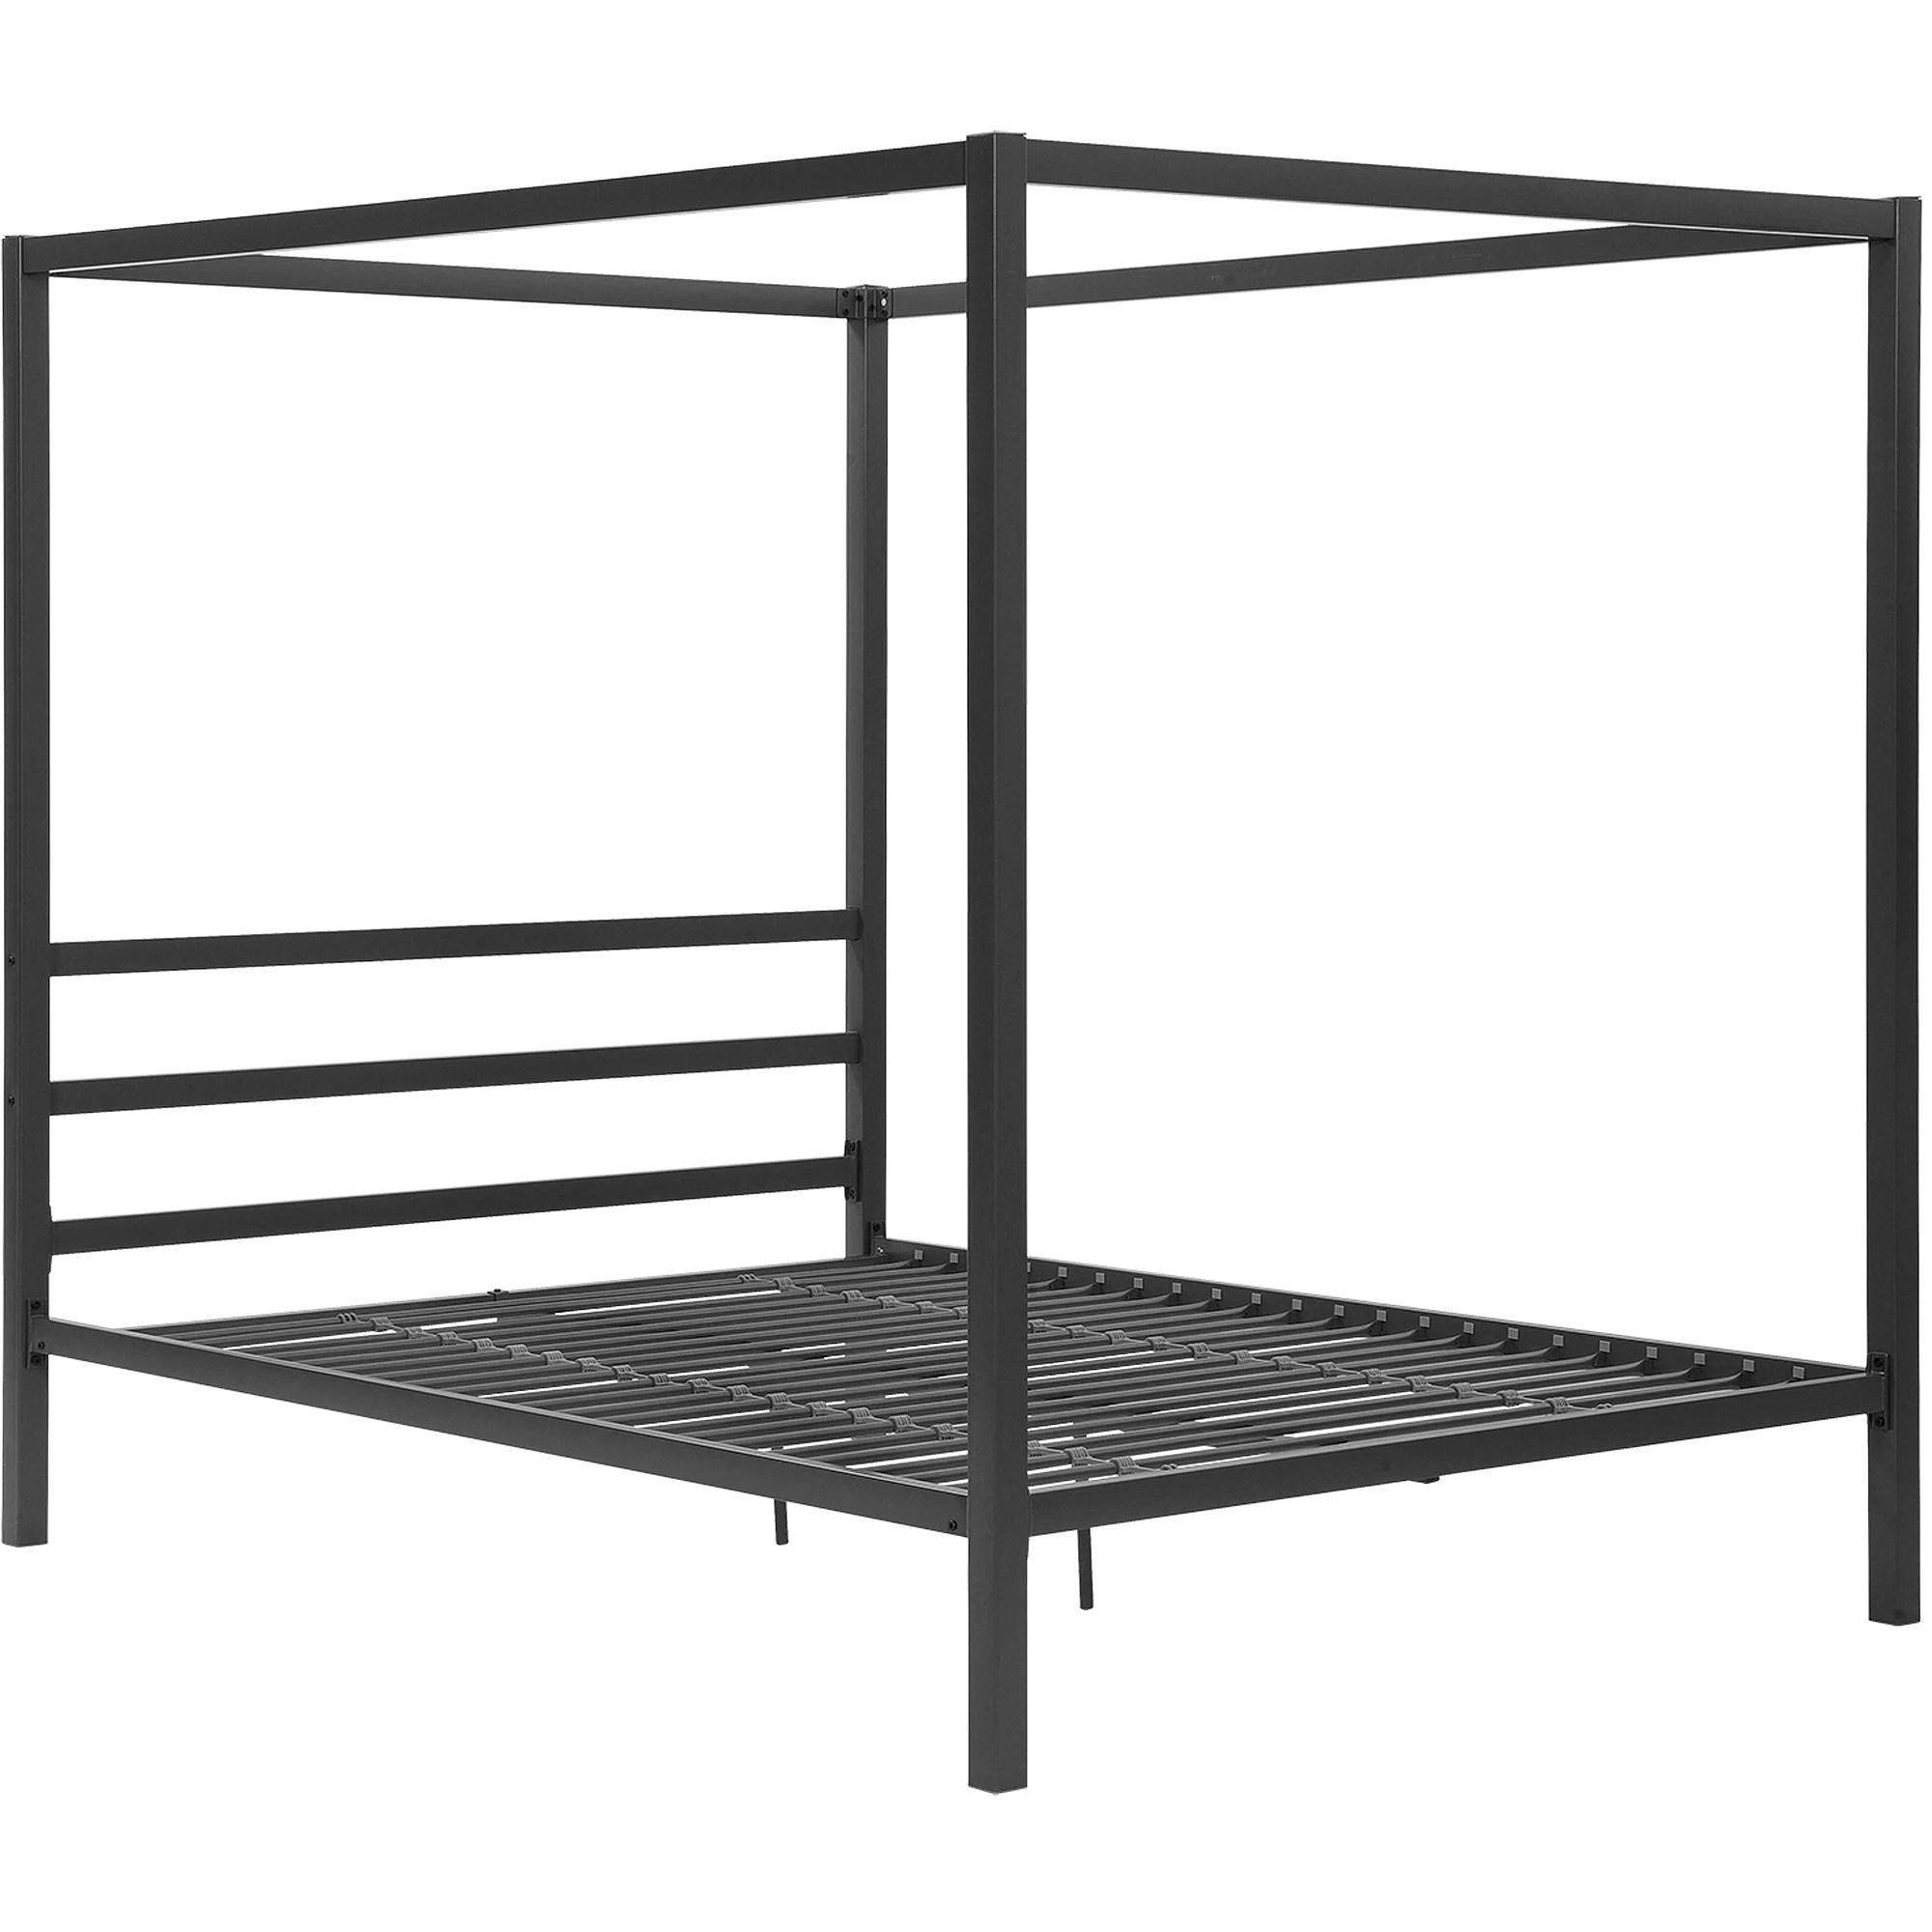 Dhp Modern Canopy Gunmetal Gray Metal Bed Queen Walmart Com Walmart Com